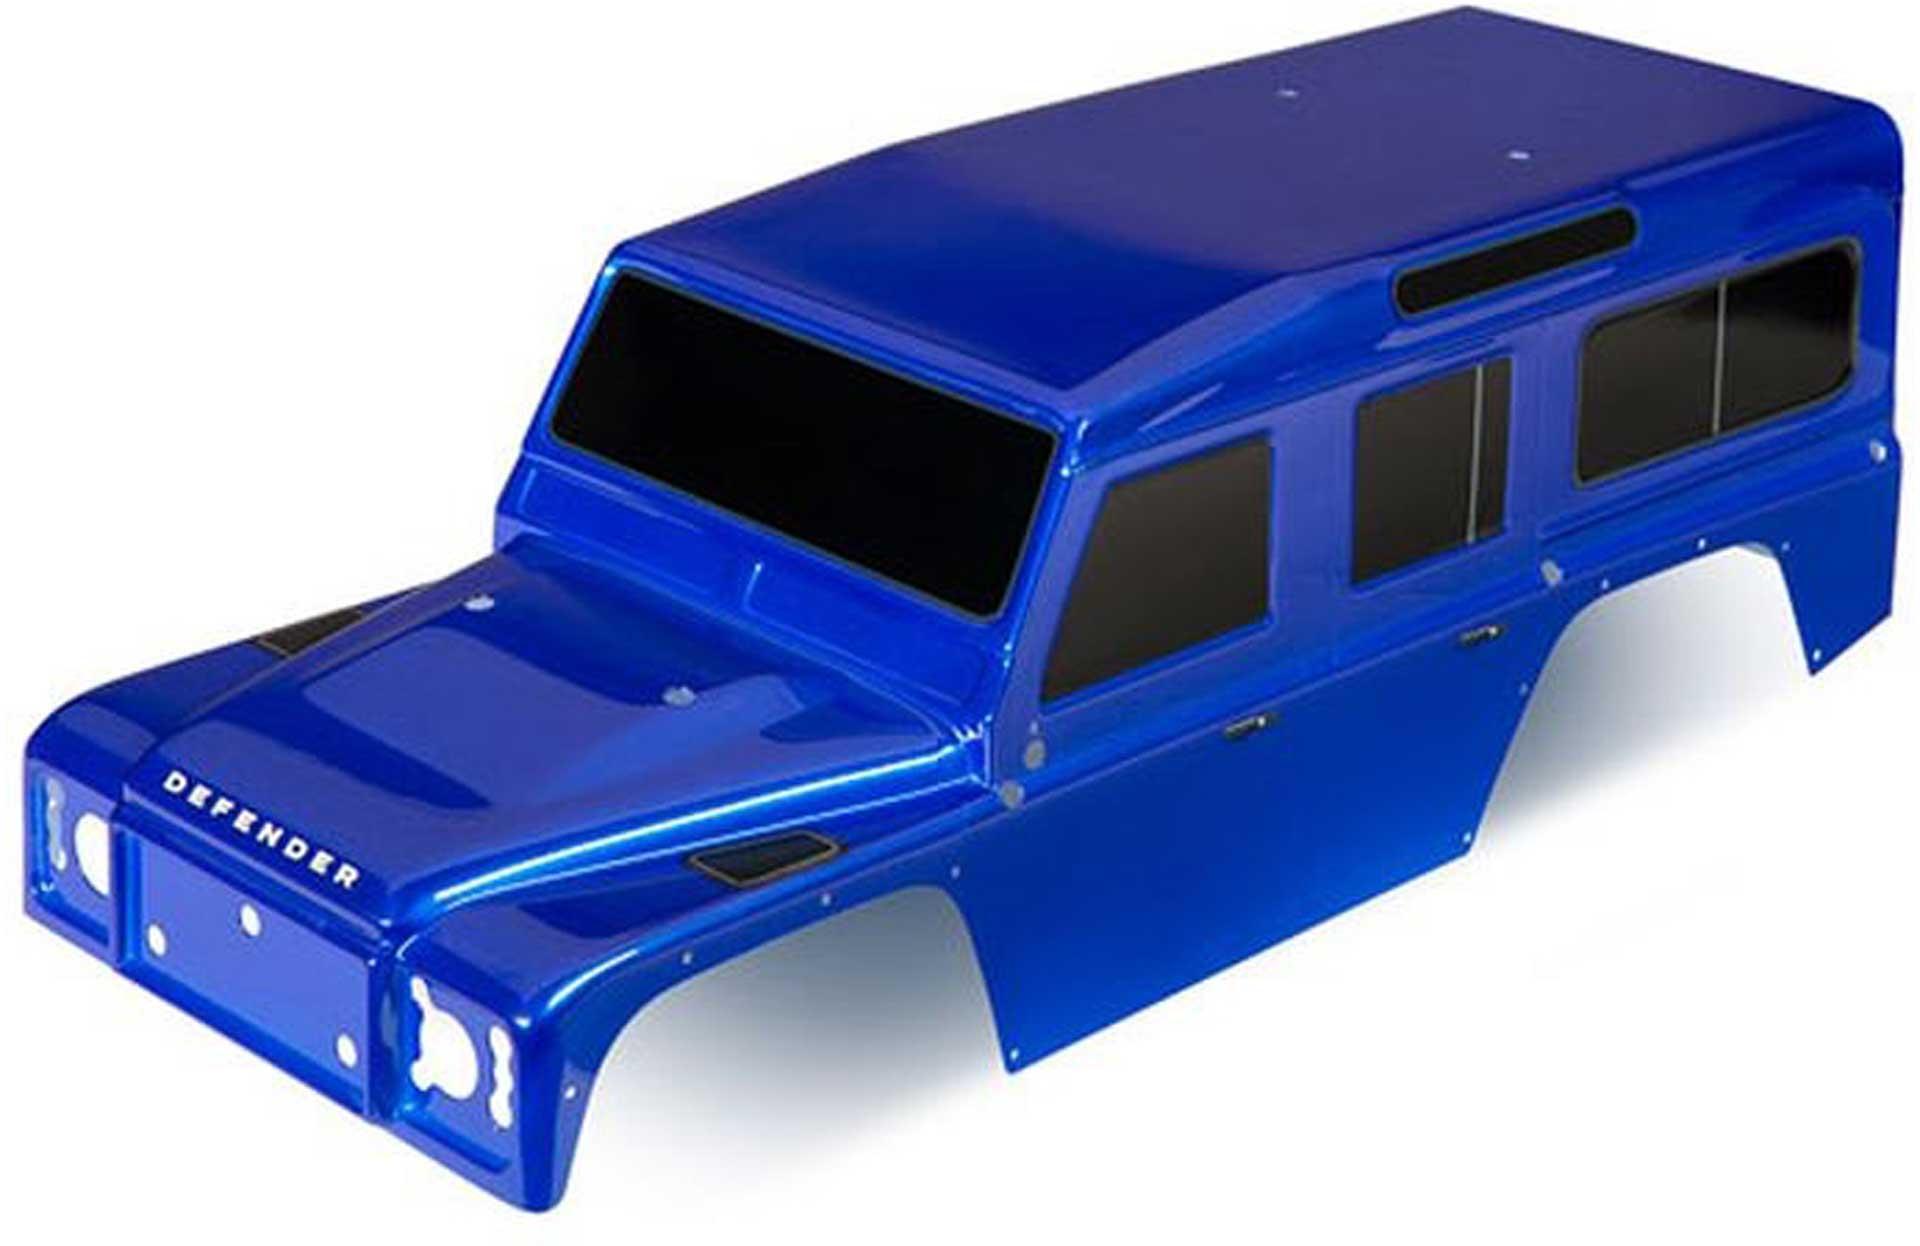 TRAXXAS Karosserie Land Rover Defender blau inkl. Decals TRX-4